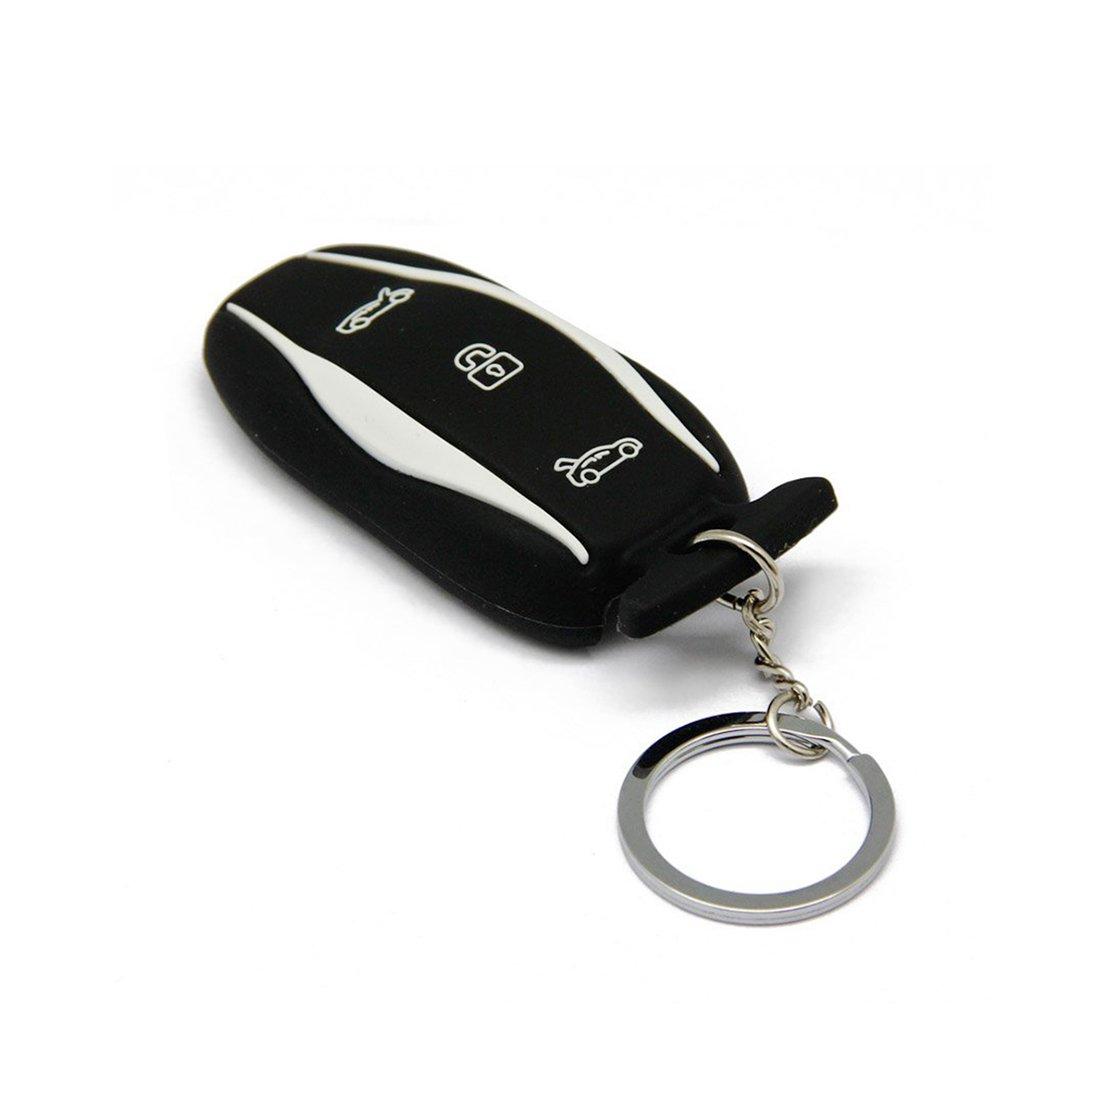 Keyring Key Case Cover Holder for Model S-Black Topfit Silicone Car Key Fob